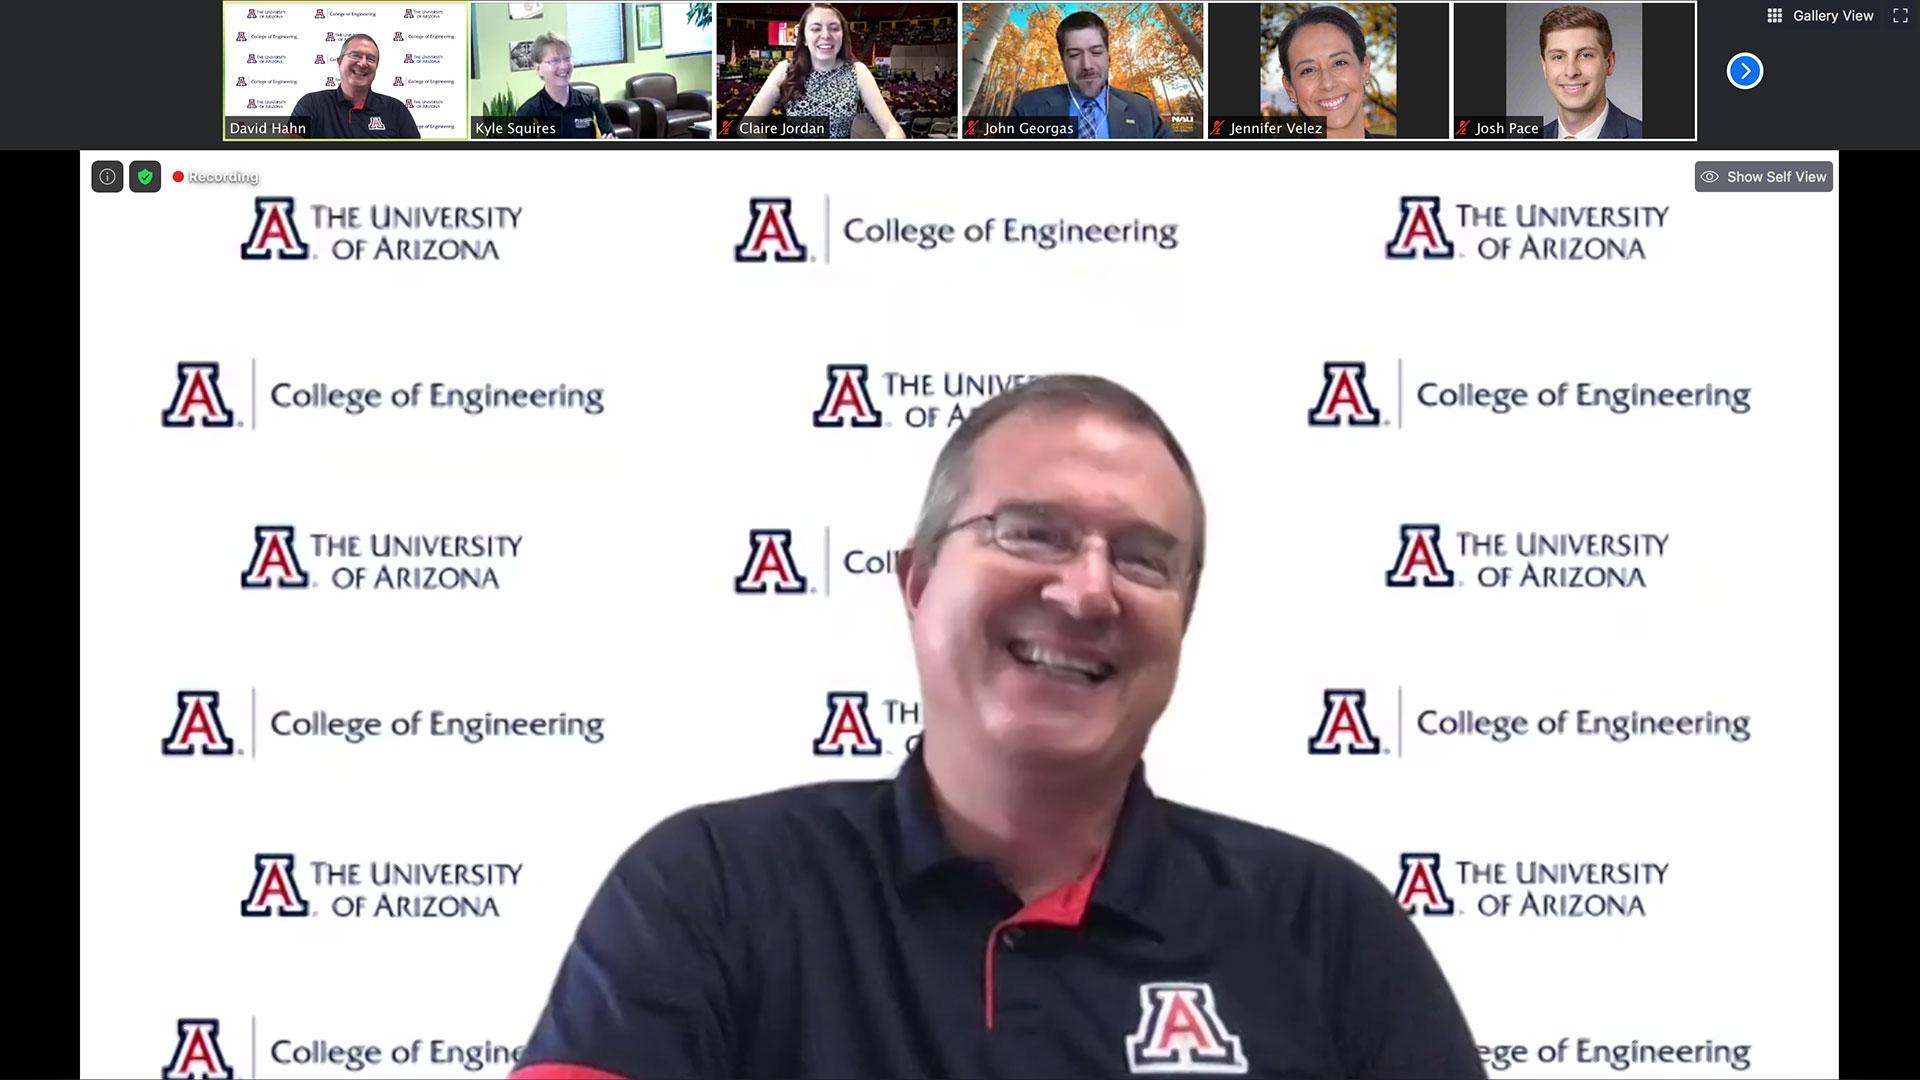 University of Arizona's David W. Hahn speaks during The Challenge online panel of Arizona university deans.